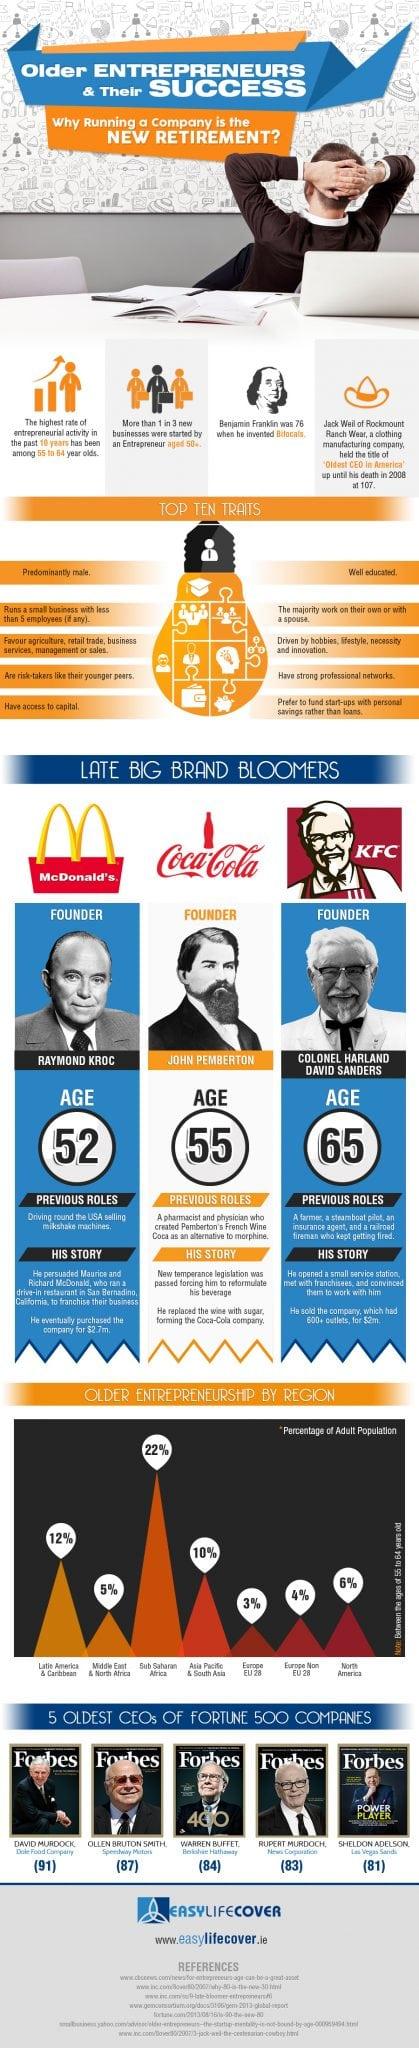 older-entrepreneurs-success